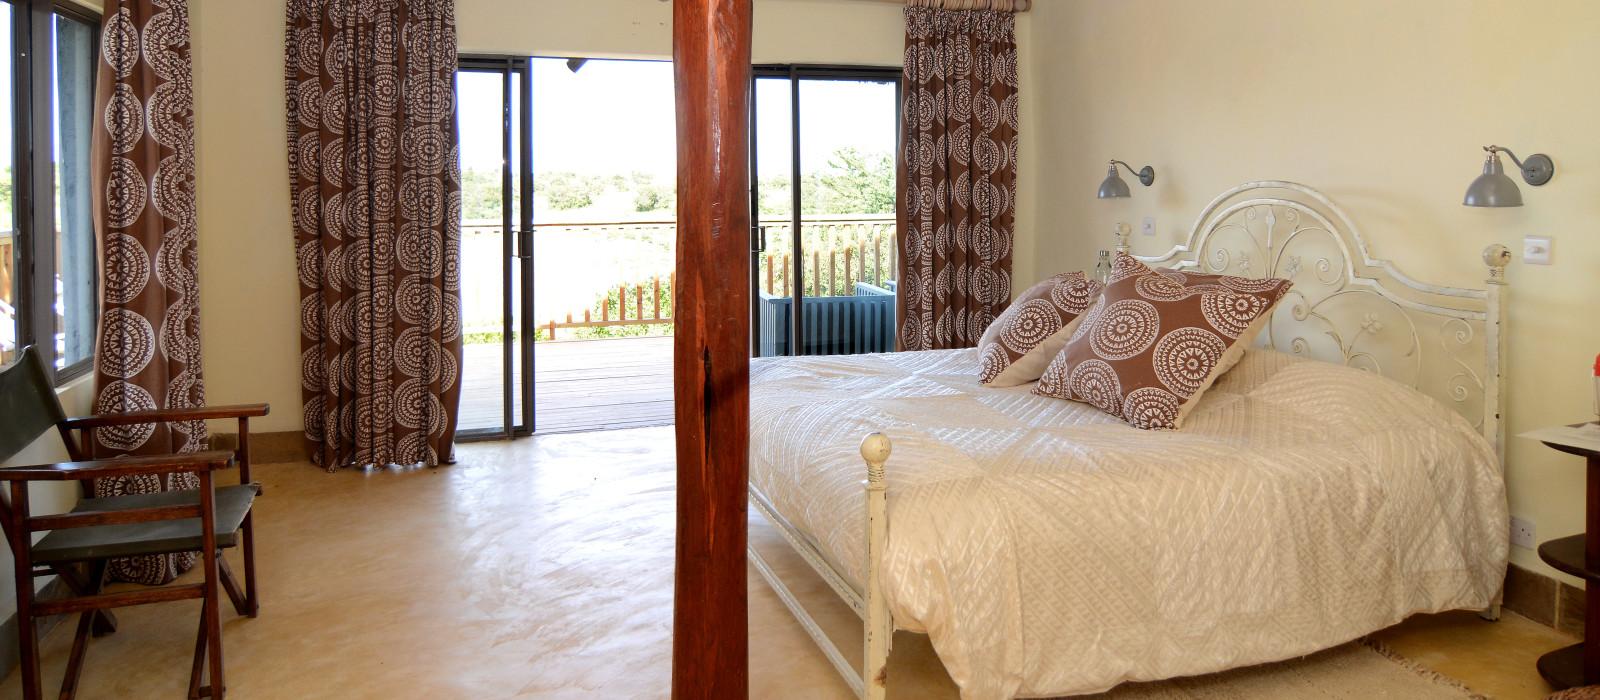 Hotel Pelican House Kenia